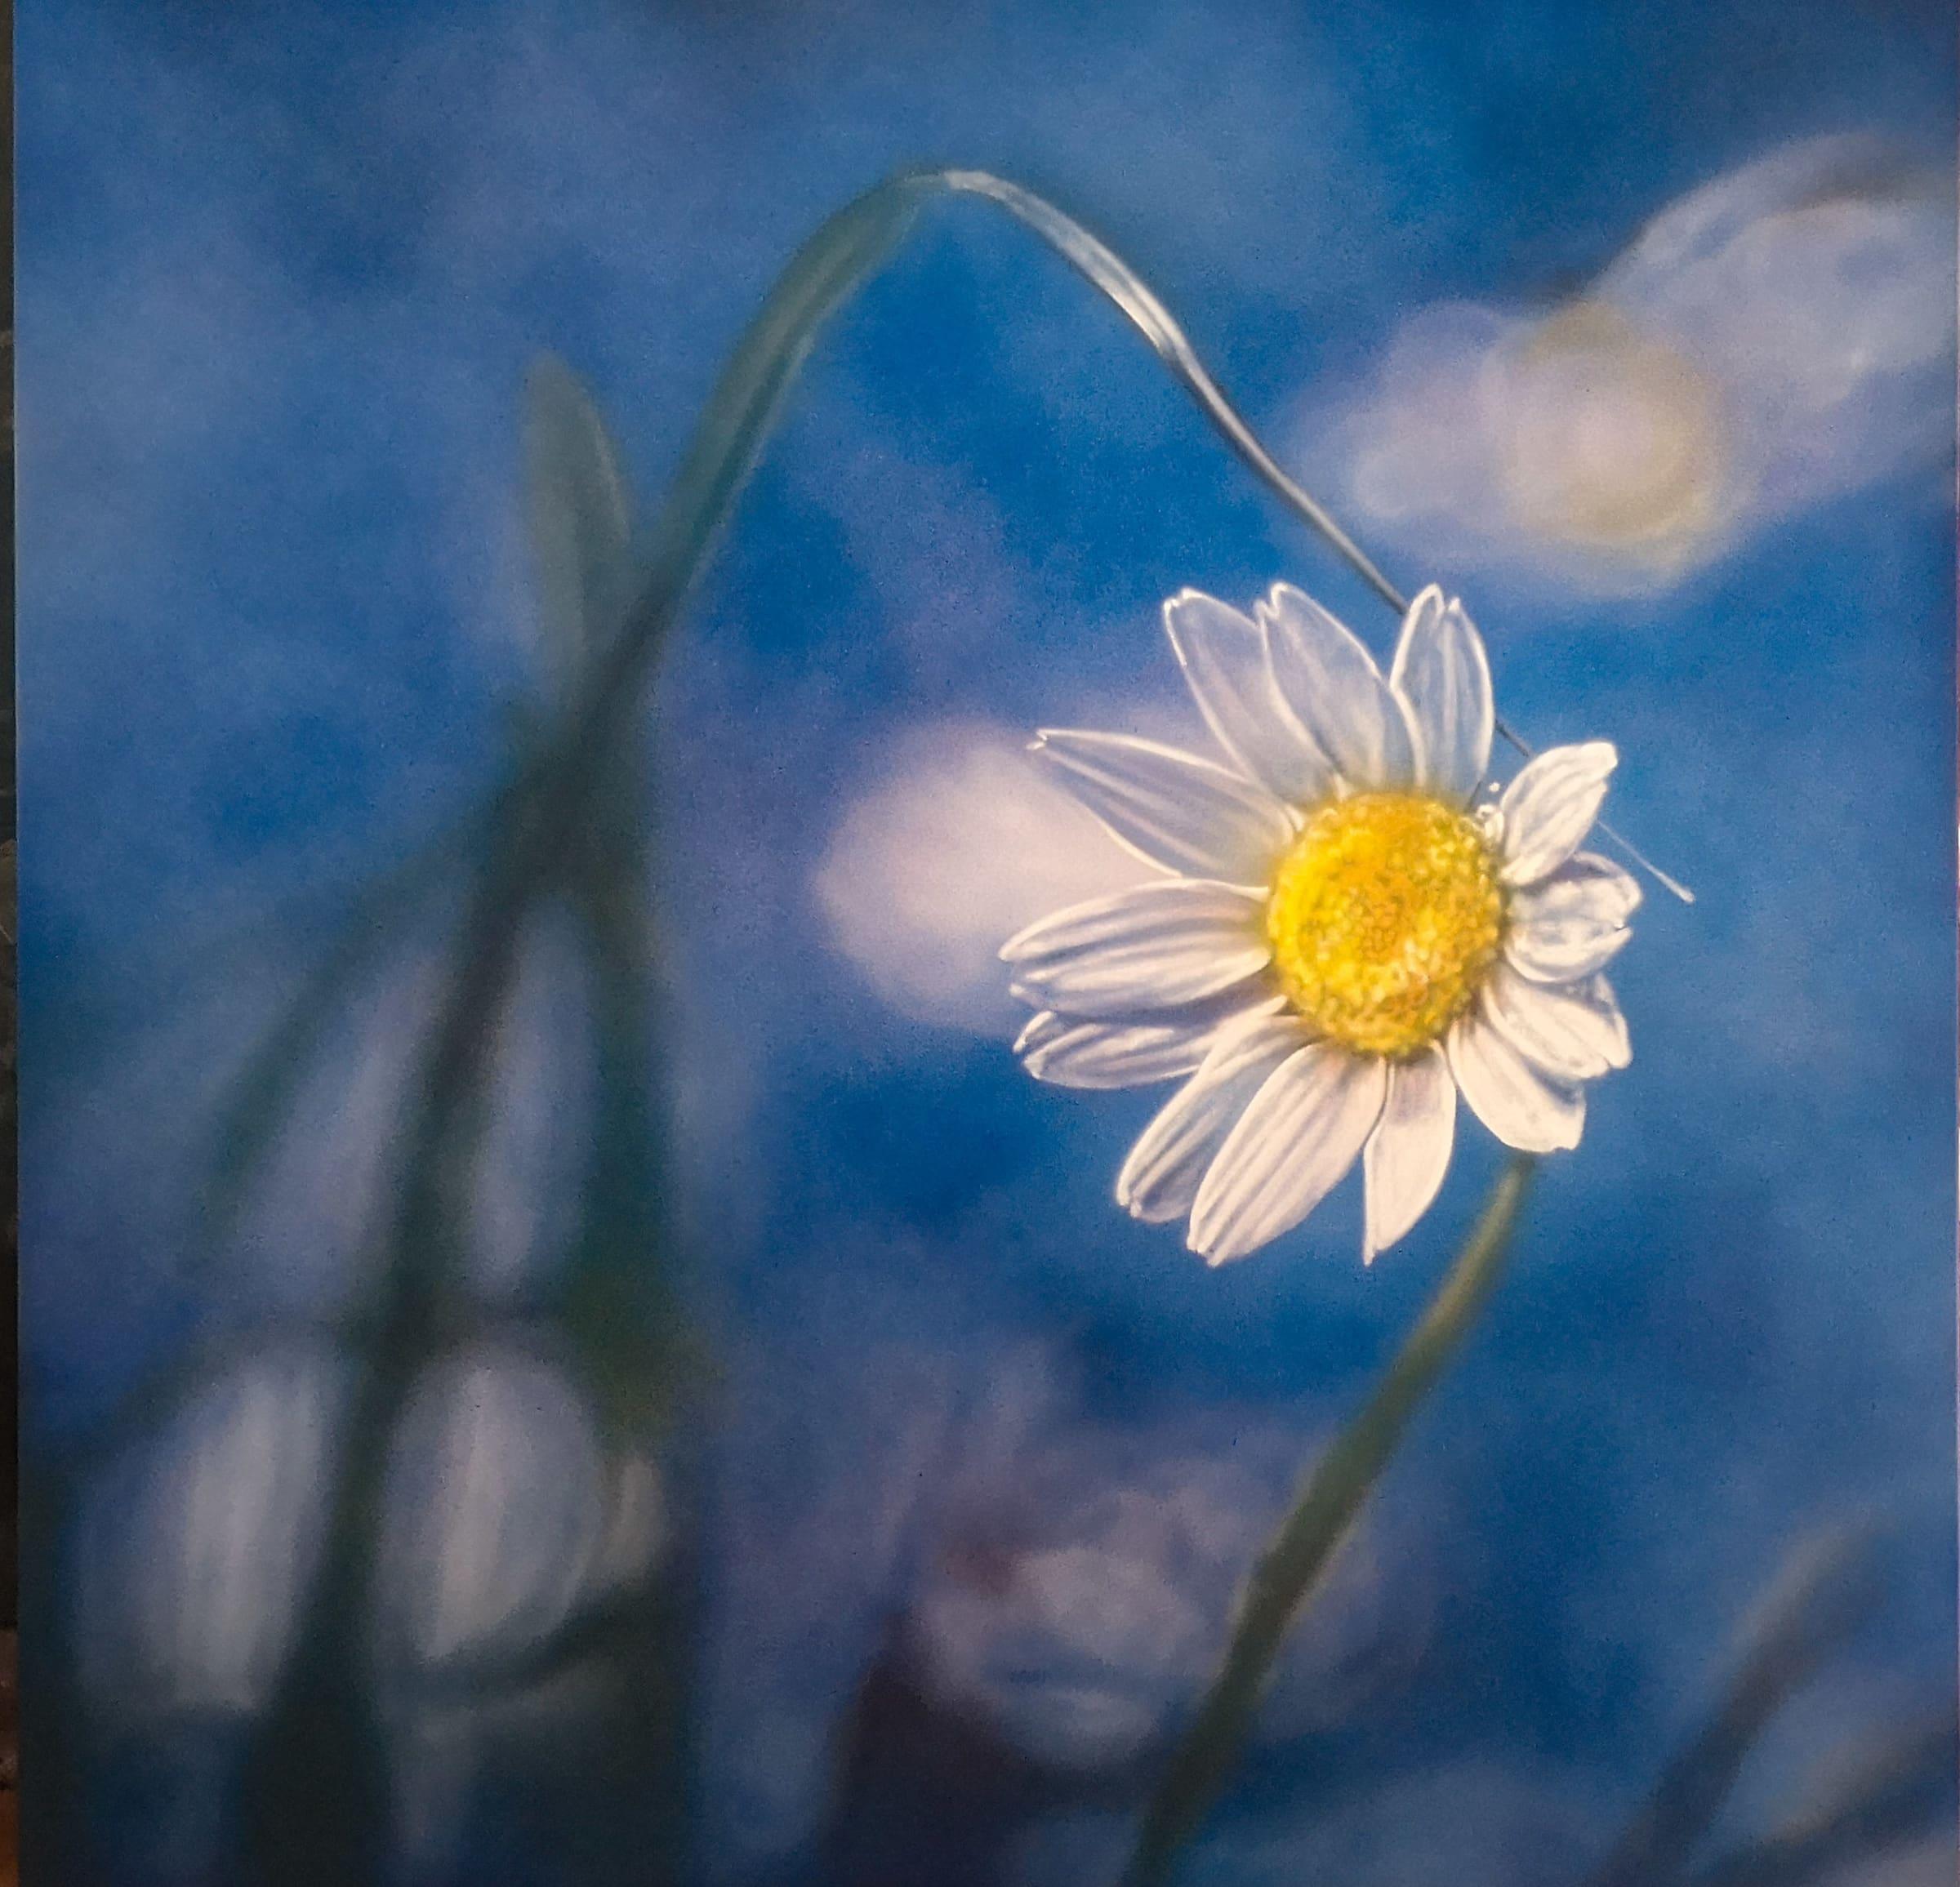 <span class=&#34;link fancybox-details-link&#34;><a href=&#34;/artists/73-sascha-%26-tashi-stylianou/works/2926-sascha-tashi-stylianou-floral-happiness-2-2018/&#34;>View Detail Page</a></span><div class=&#34;artist&#34;><strong>Sascha & Tashi Stylianou</strong></div> <div class=&#34;title&#34;><em>Floral Happiness 2</em>, 2018</div> <div class=&#34;medium&#34;>Acrylic In Brush & Spray On Canvas</div> <div class=&#34;dimensions&#34;>150cm x 150cm</div><div class=&#34;price&#34;>R20,000.00</div>